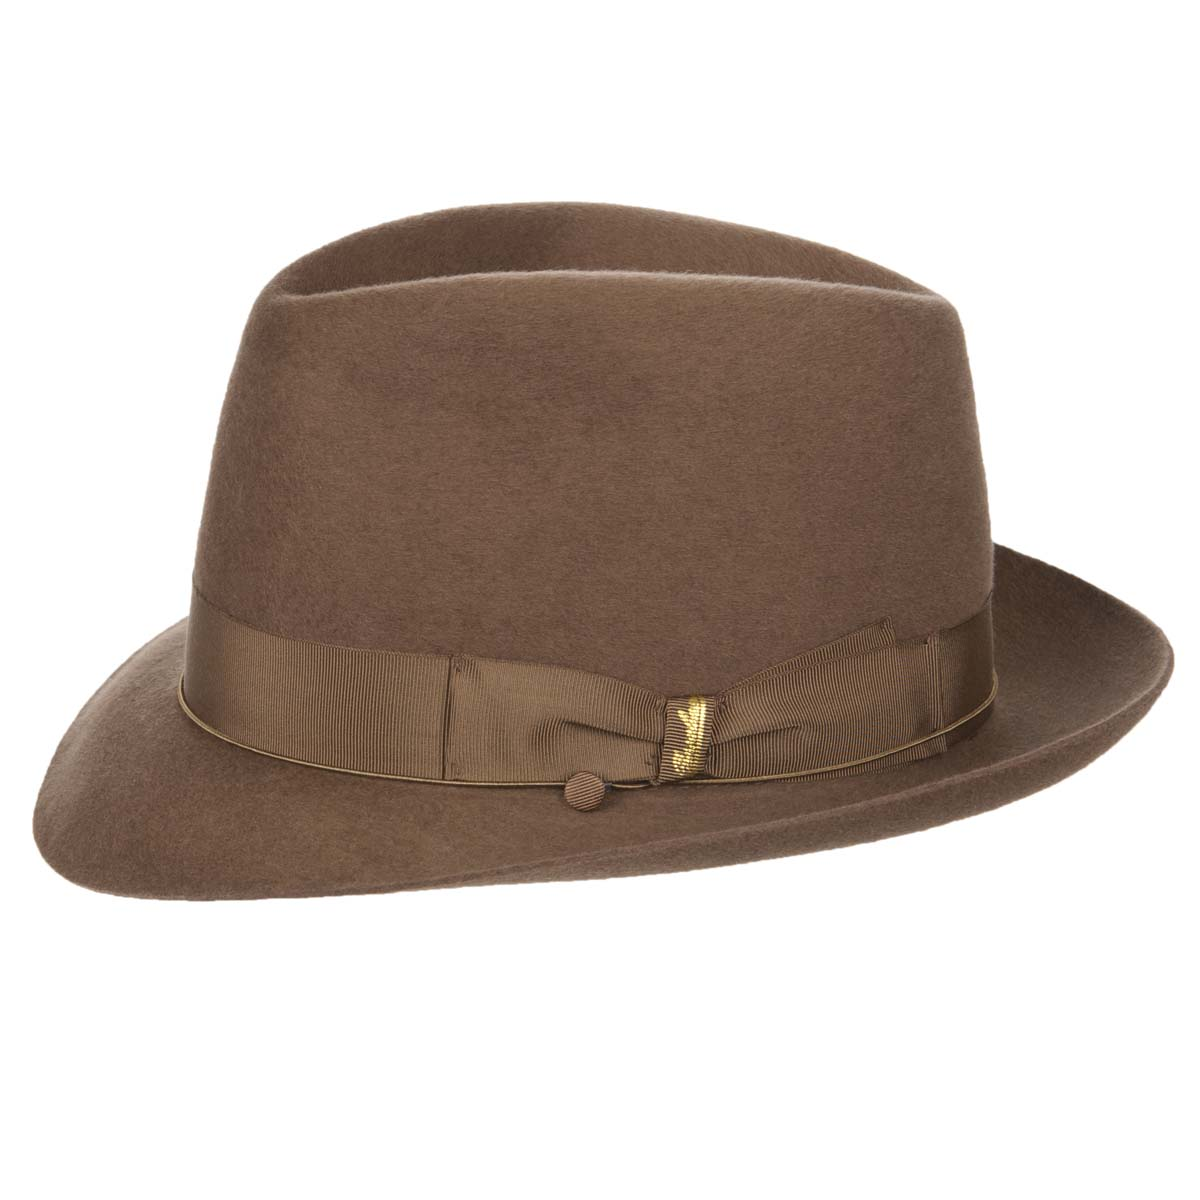 be8f102ae71 Wide brimmed hat in furfelt by Borsalino